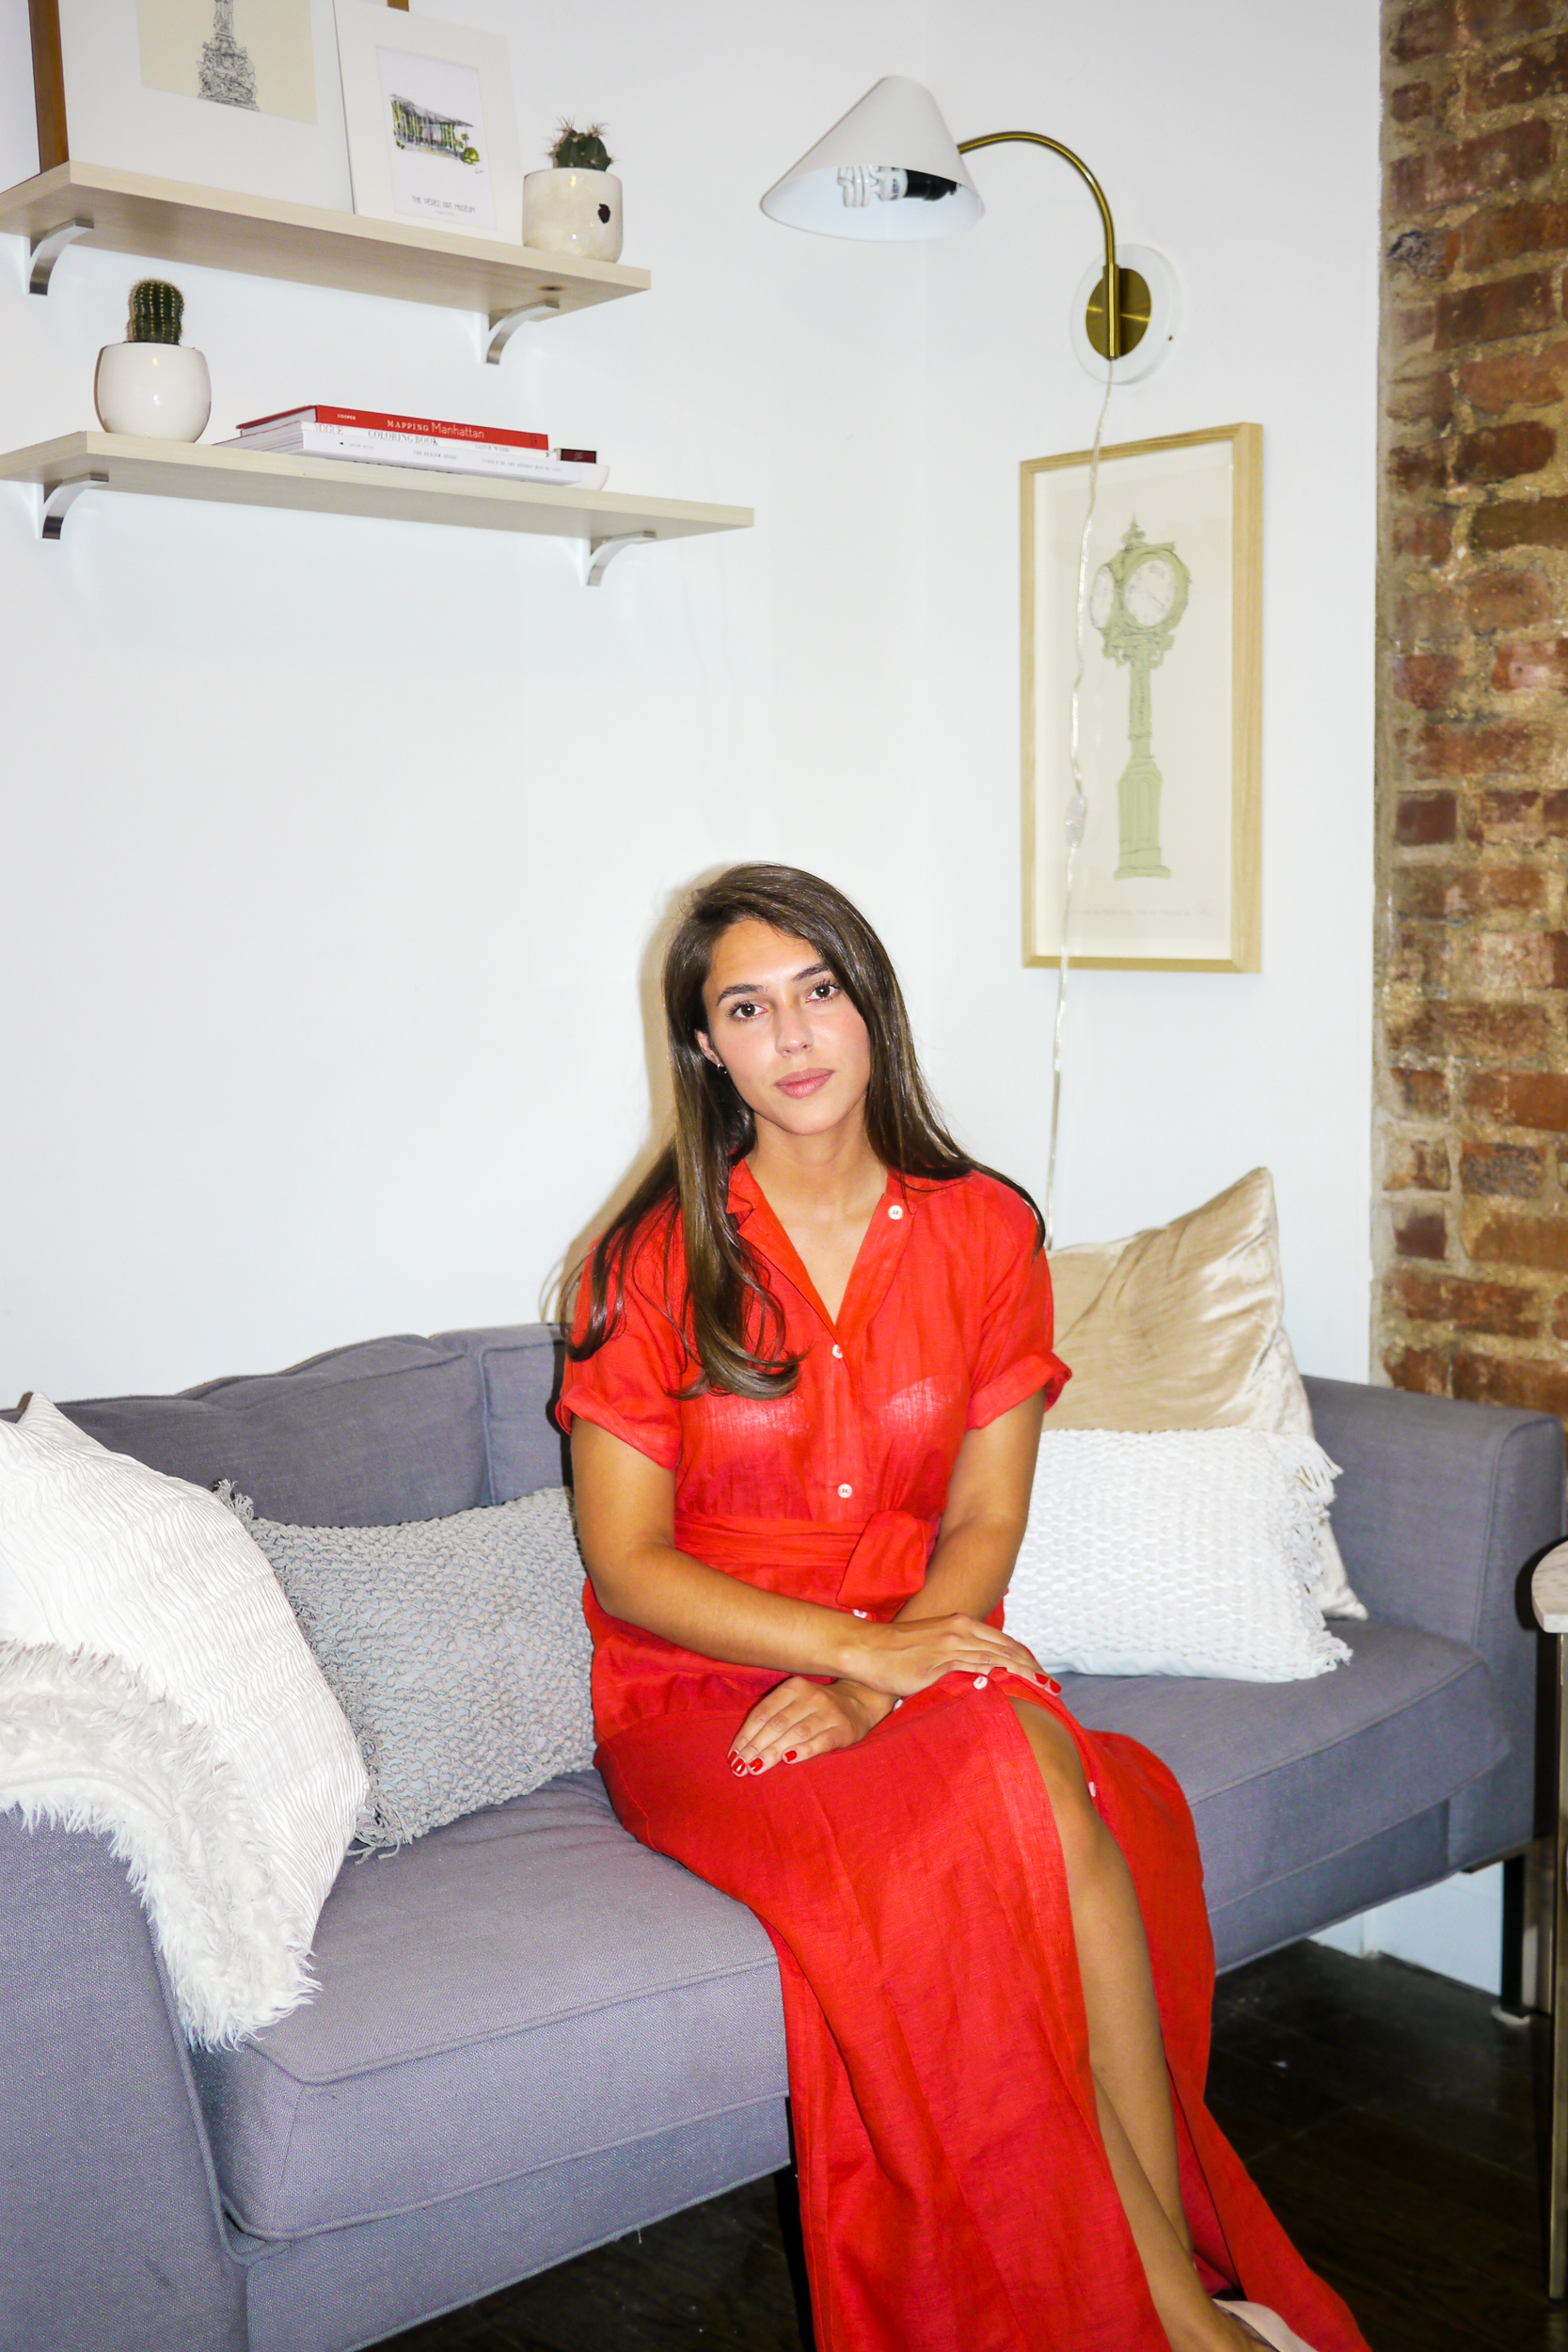 Dress: Micaela Meyer Mayfair Shirtdress; Couch:    Marco Couch